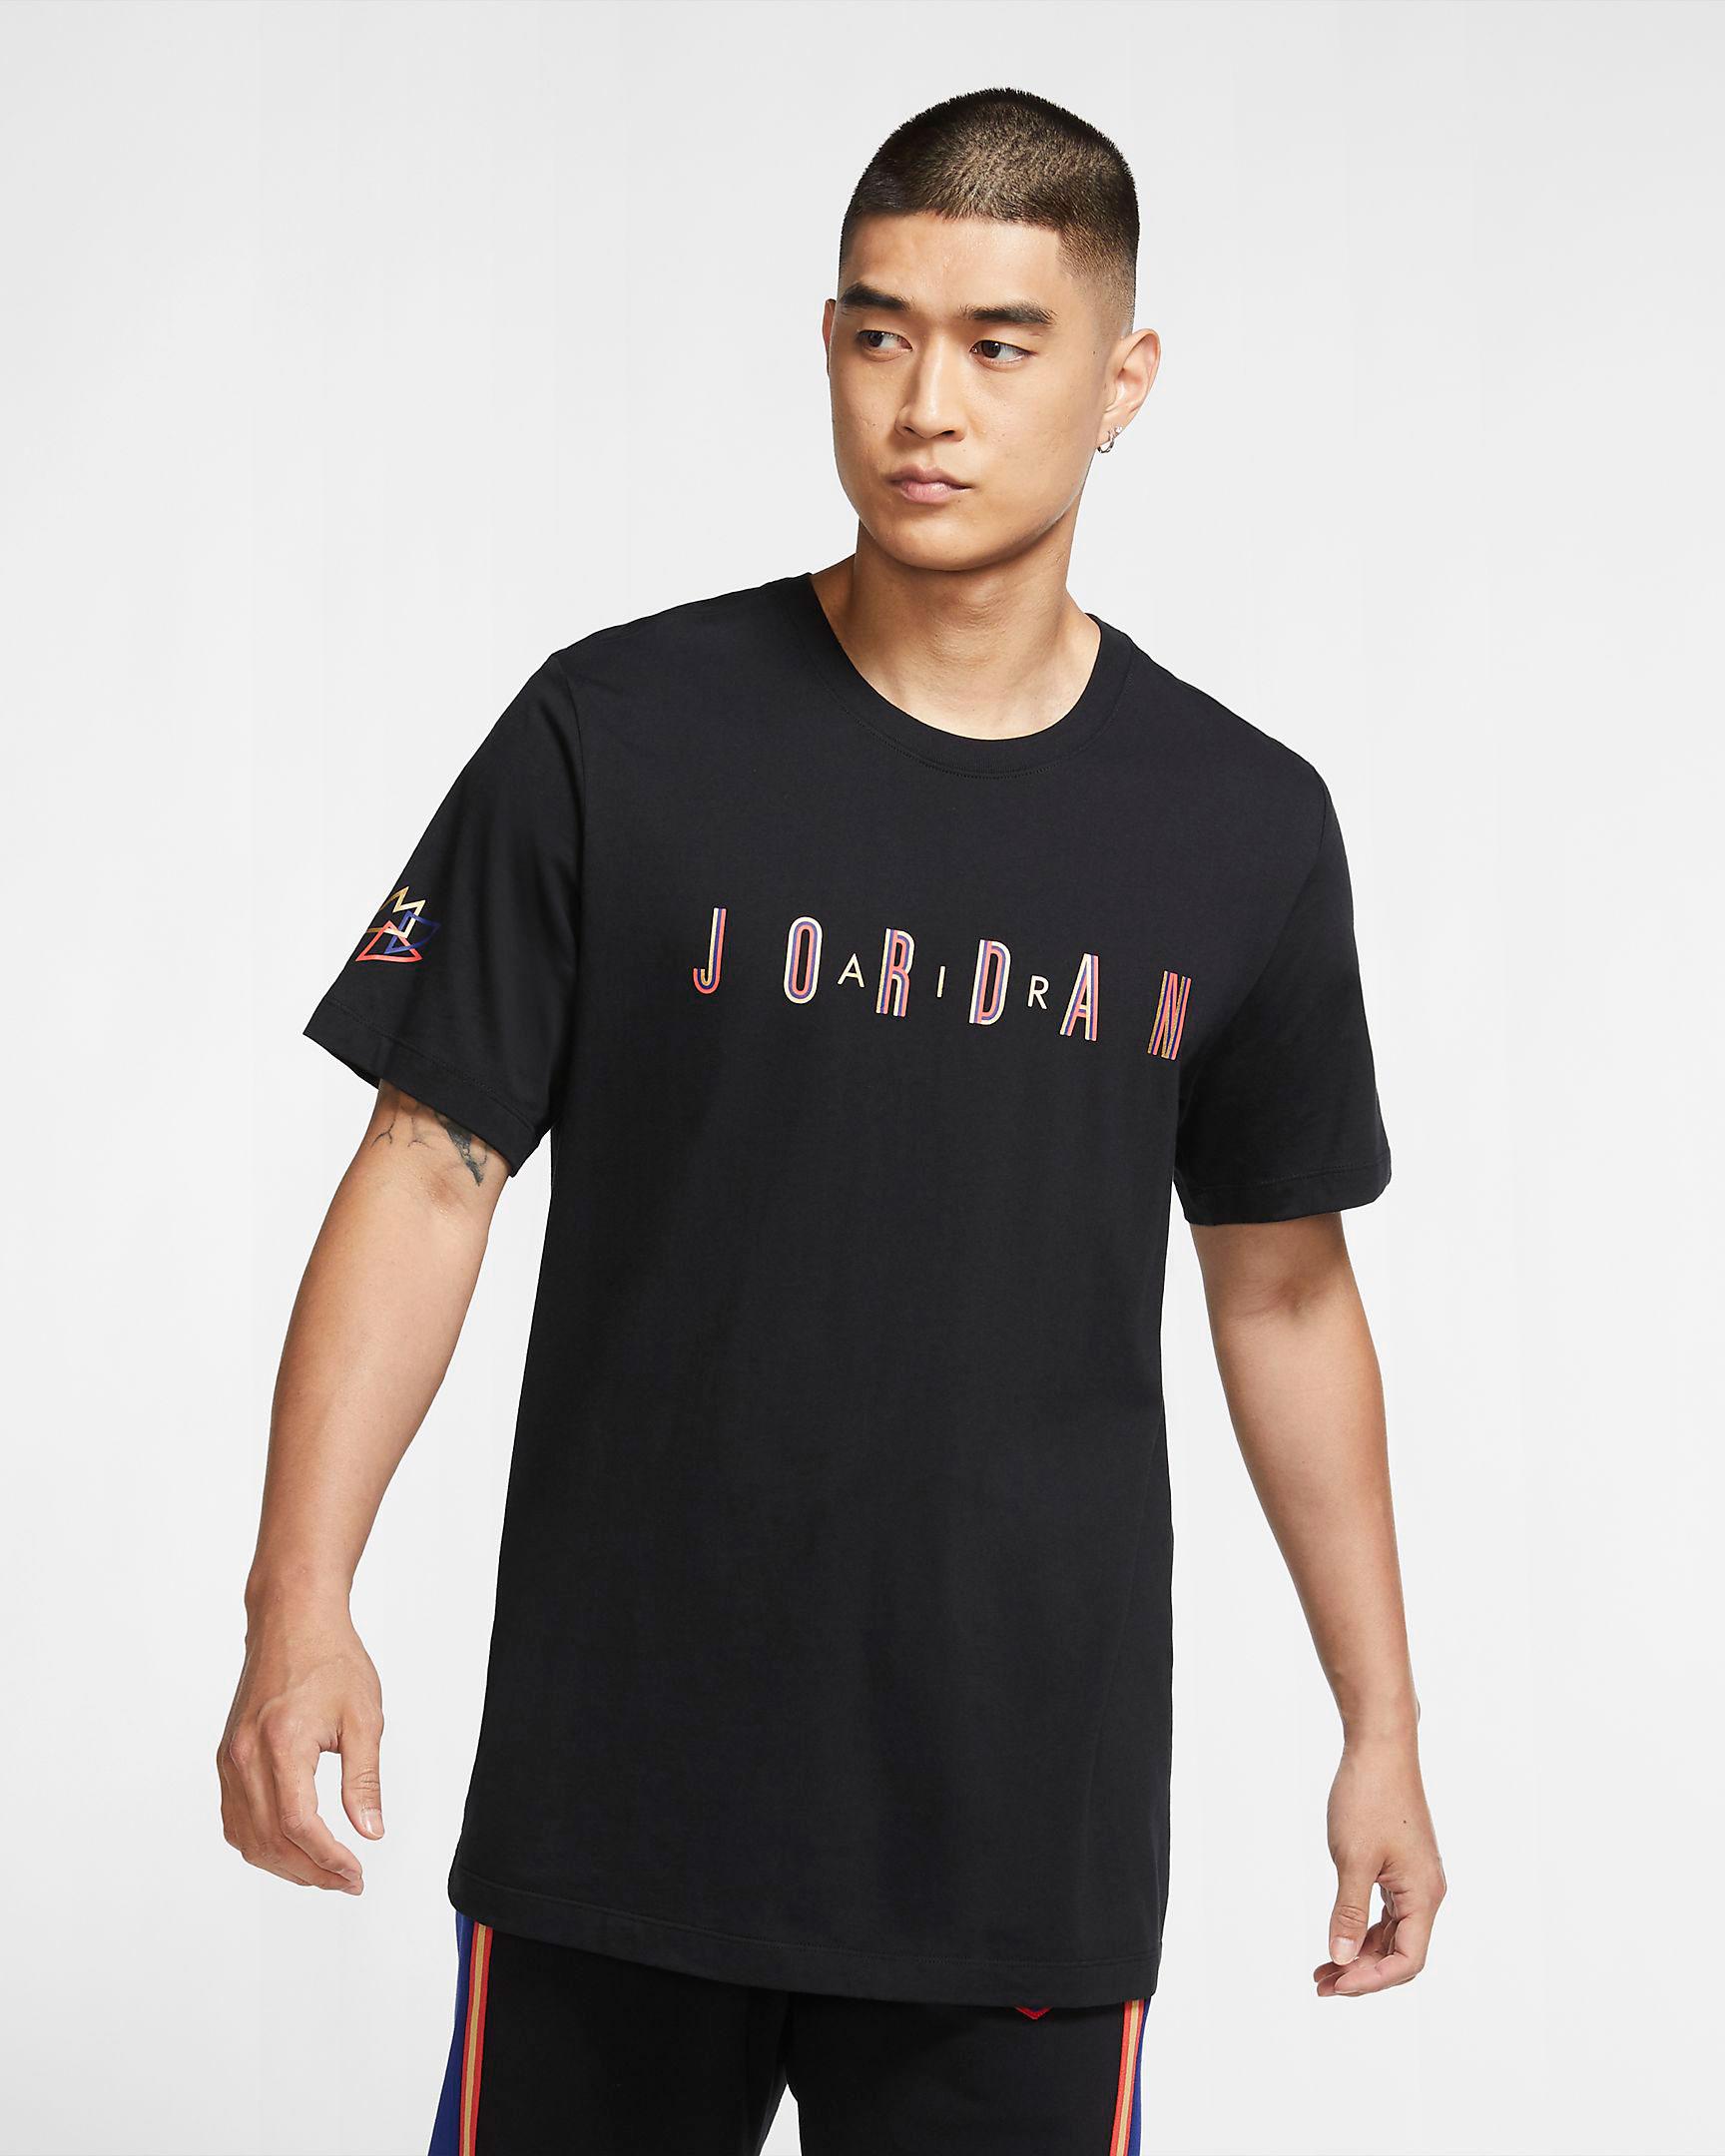 air-jordan-1-low-sweater-nothing-but-net-shirt-match-4